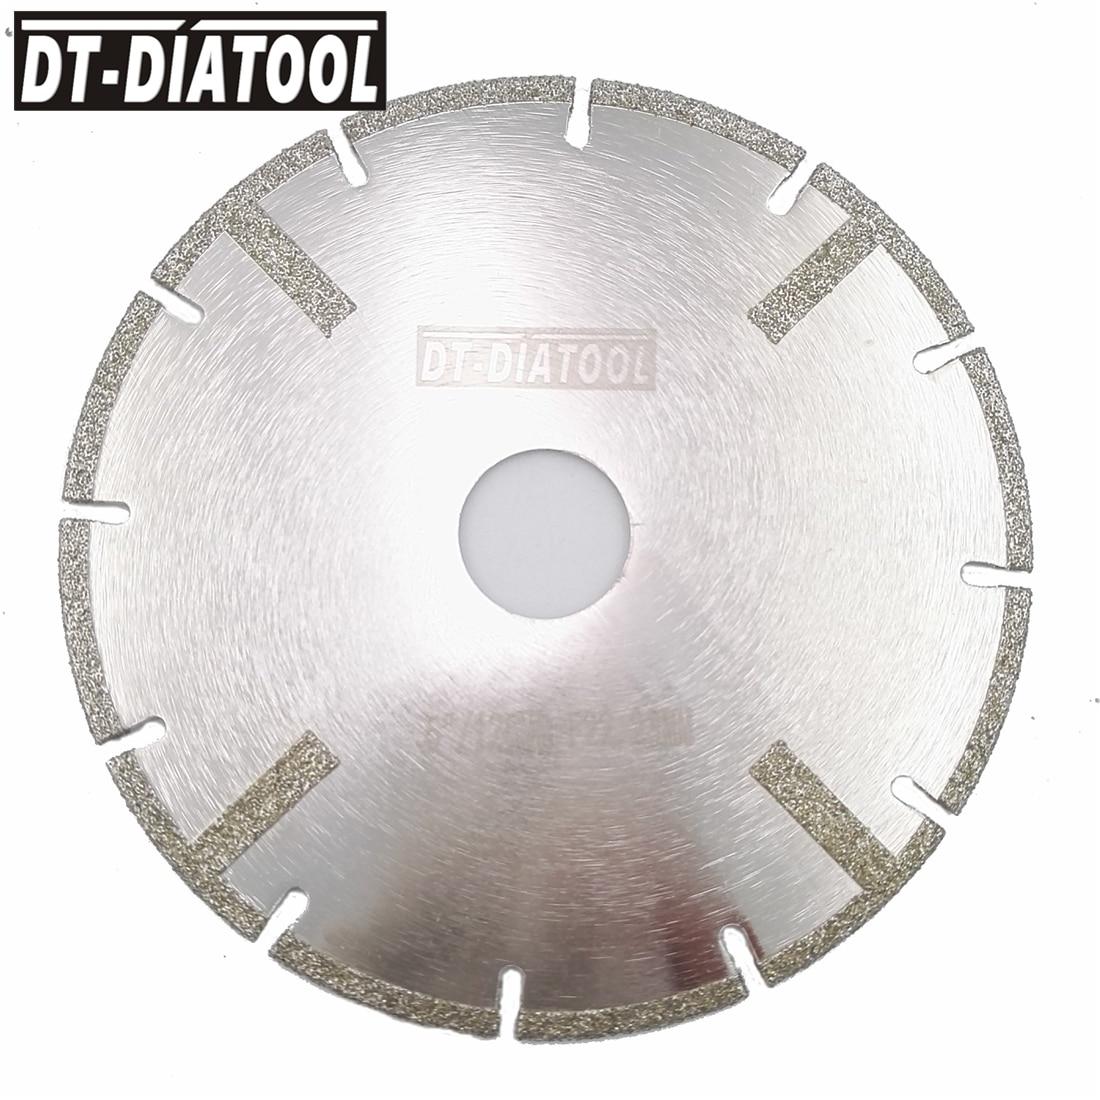 DT-DIATOOL 1pc 5